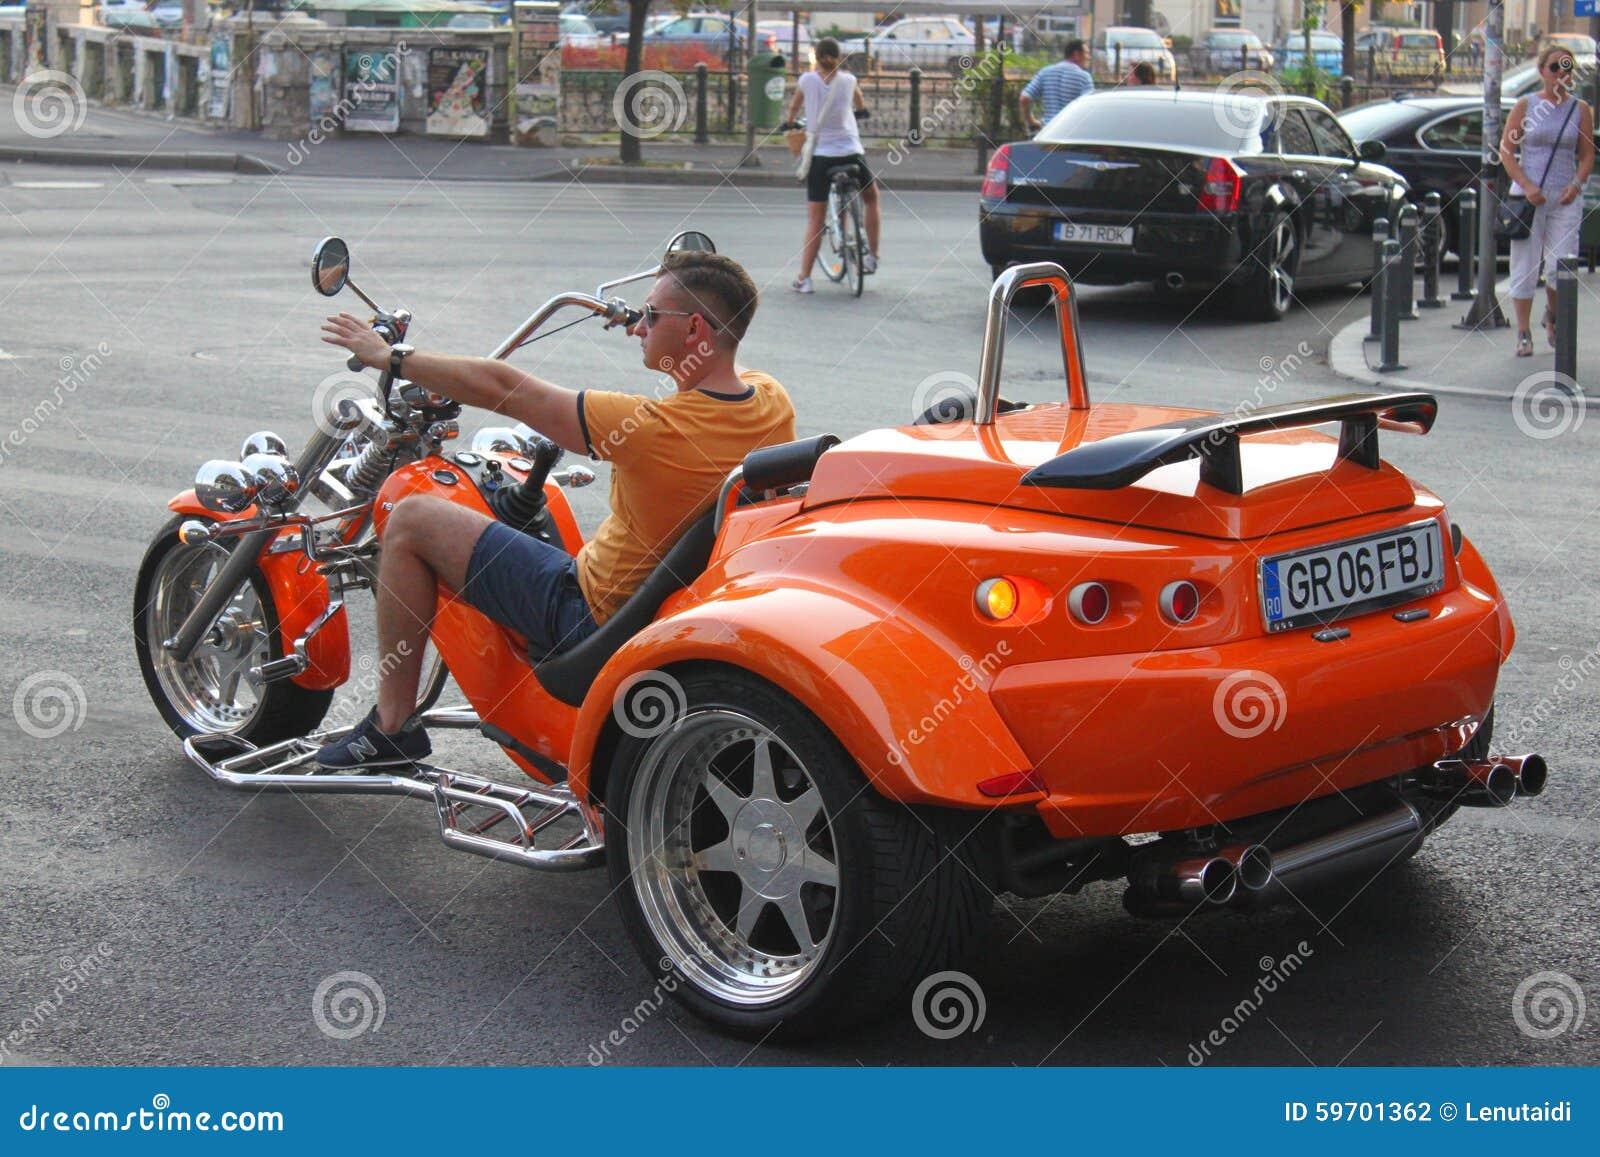 moto trois roues photographie ditorial image du vitesse 59701362. Black Bedroom Furniture Sets. Home Design Ideas